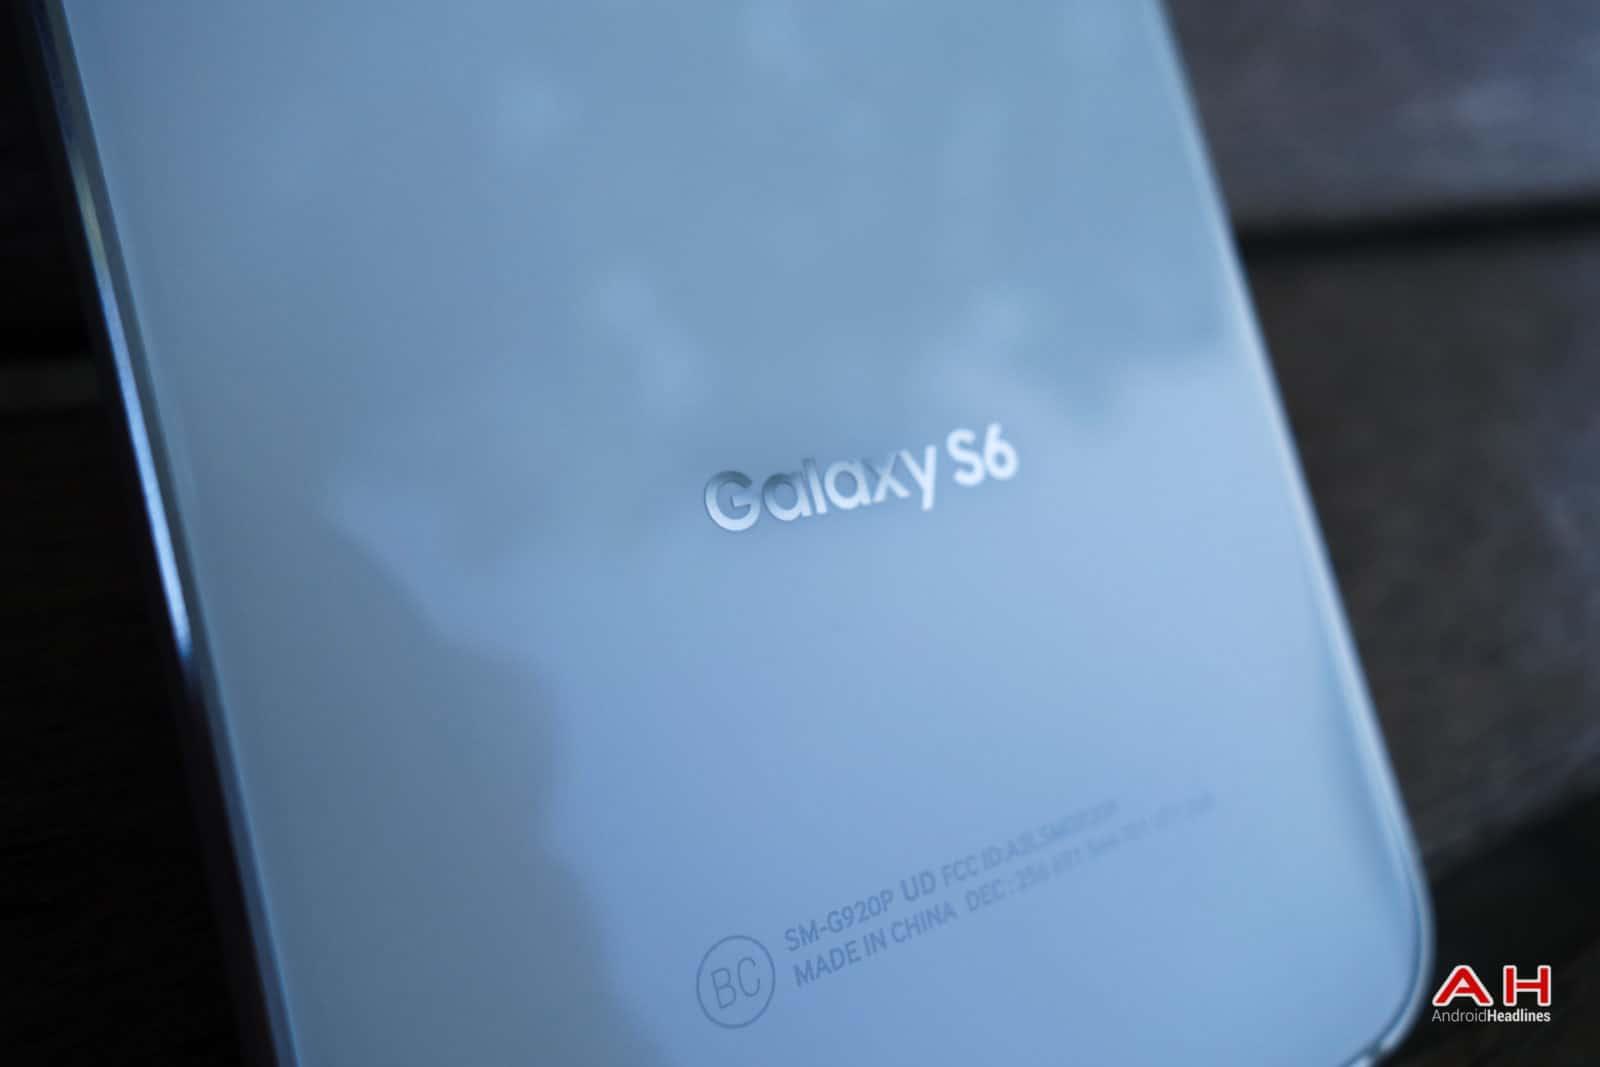 AH Samsung Galaxy S6-9